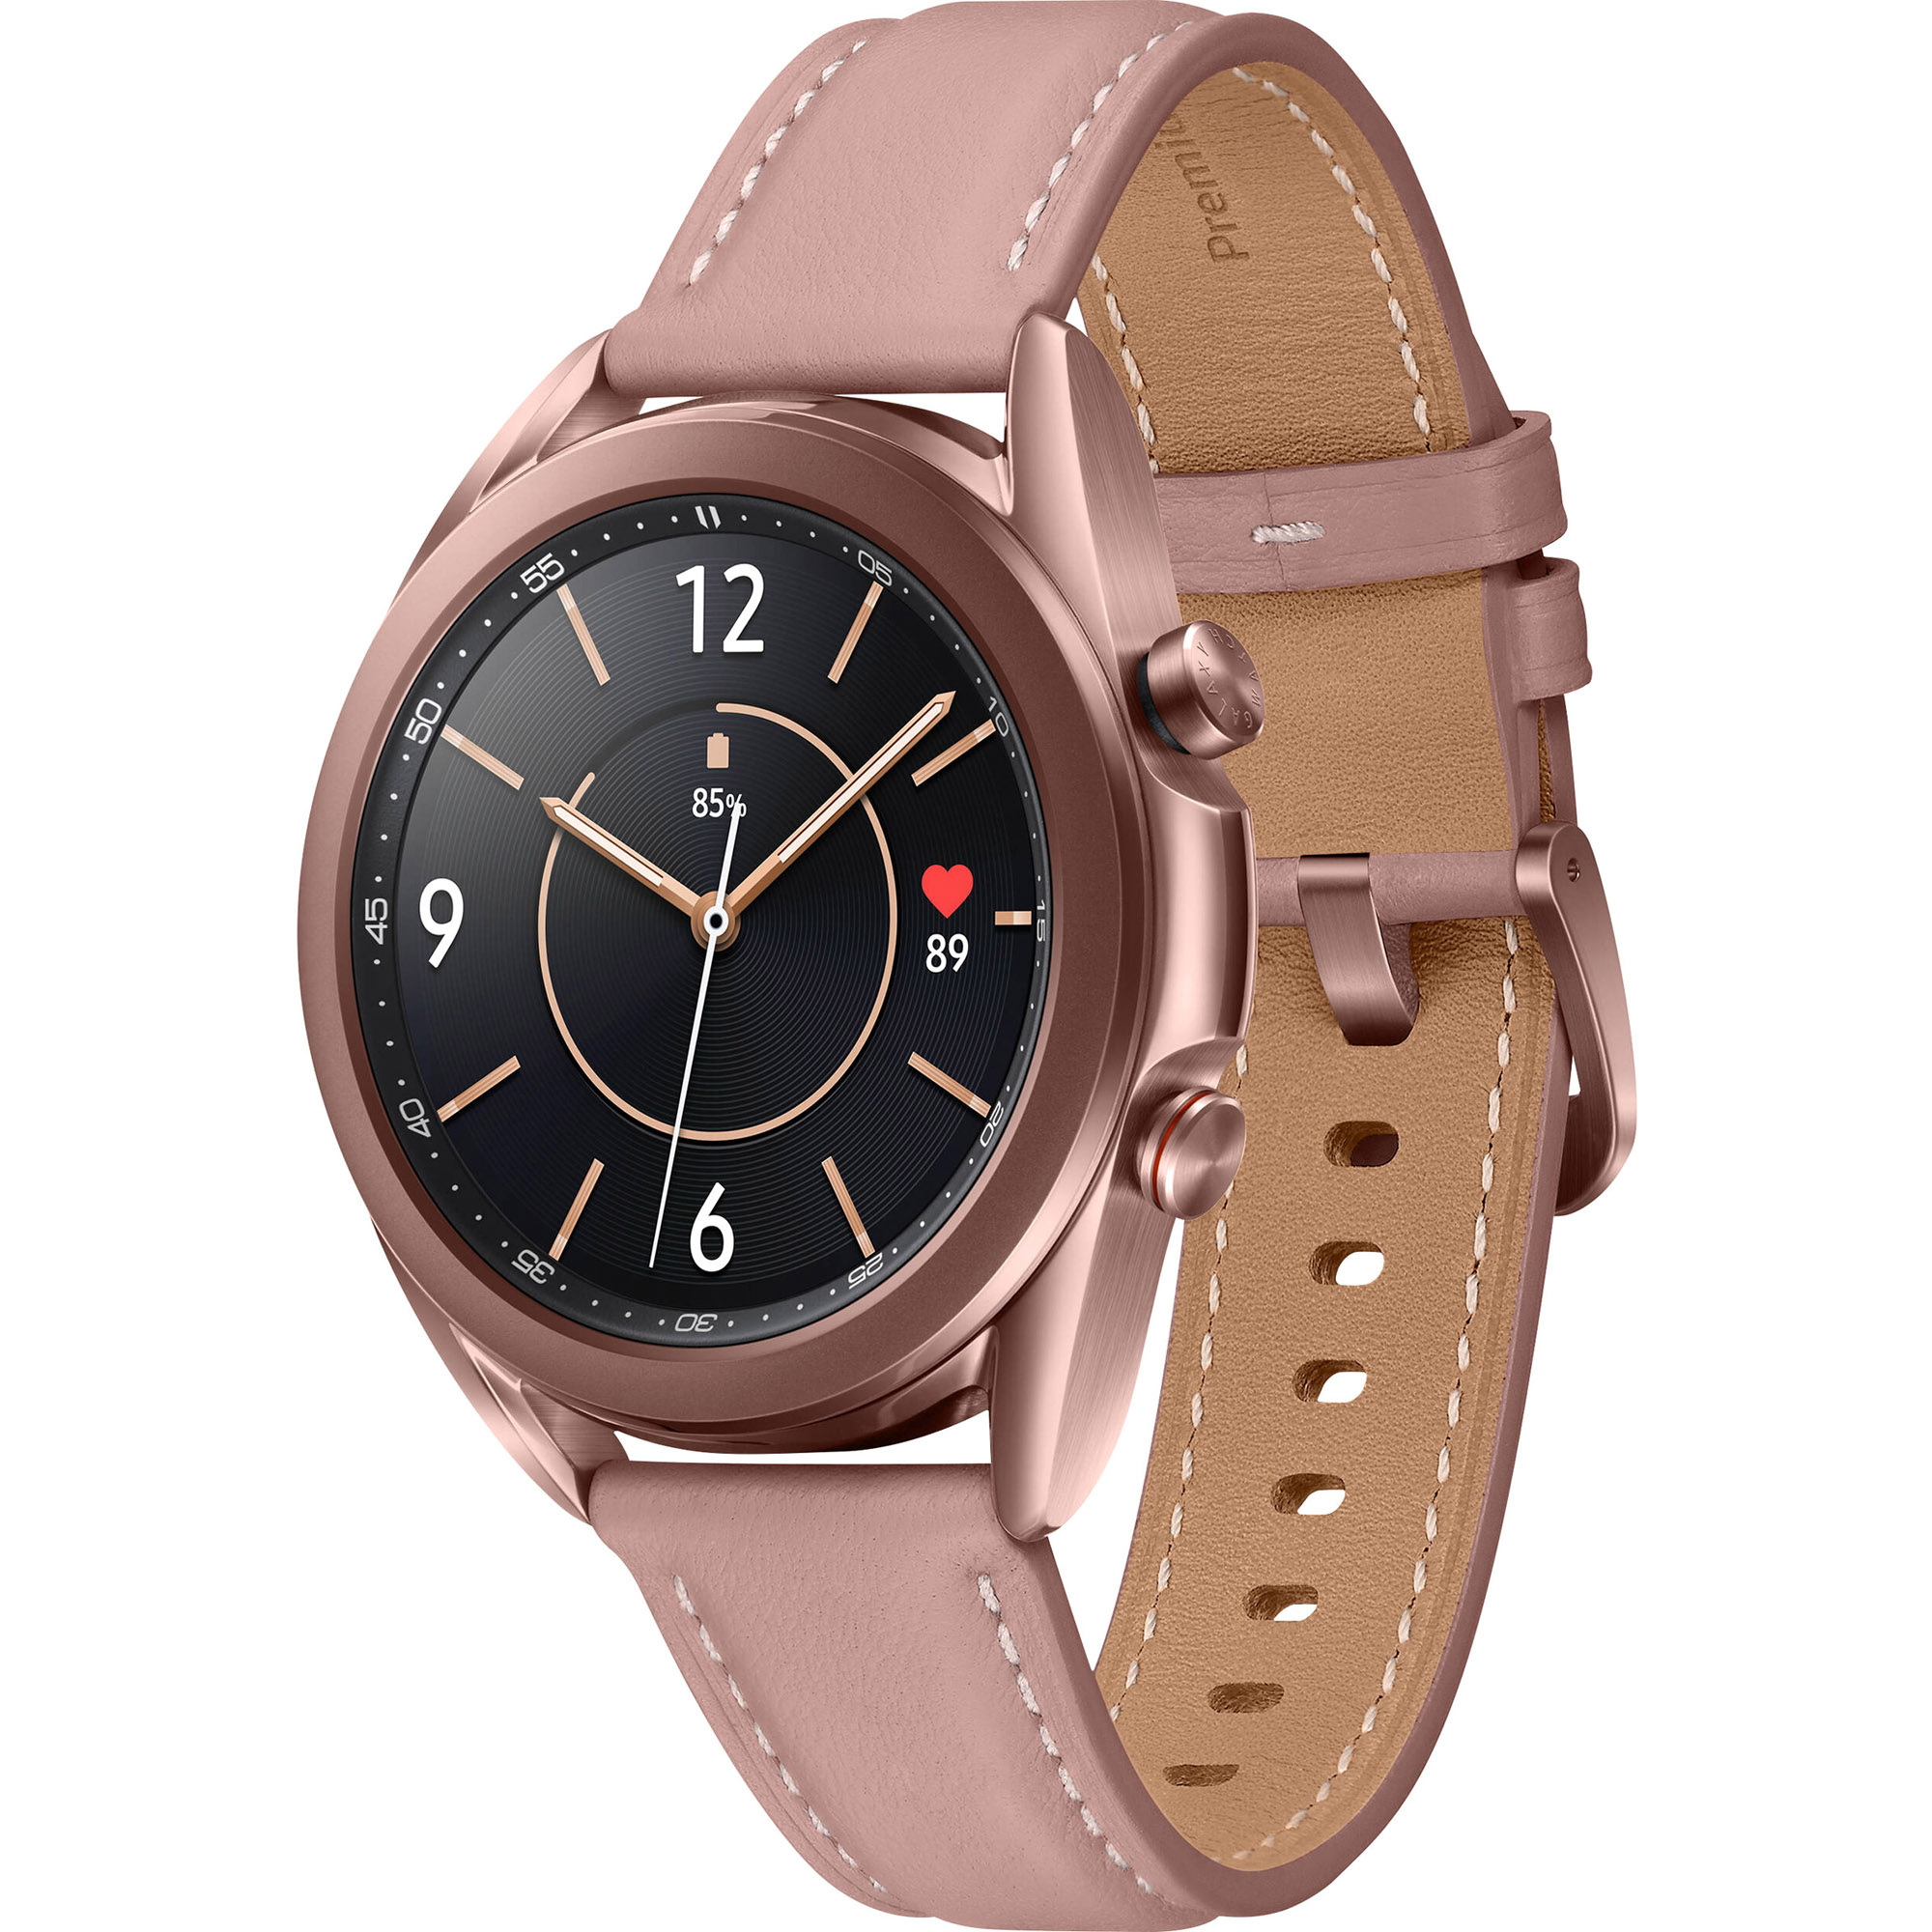 Фото - Смарт-часы Samsung Galaxy Watch3 41 мм (SM-R850NZDACIS) Бронза смарт часы samsung galaxy watch 1 3 super amoled серебристый sm r800nzsaser